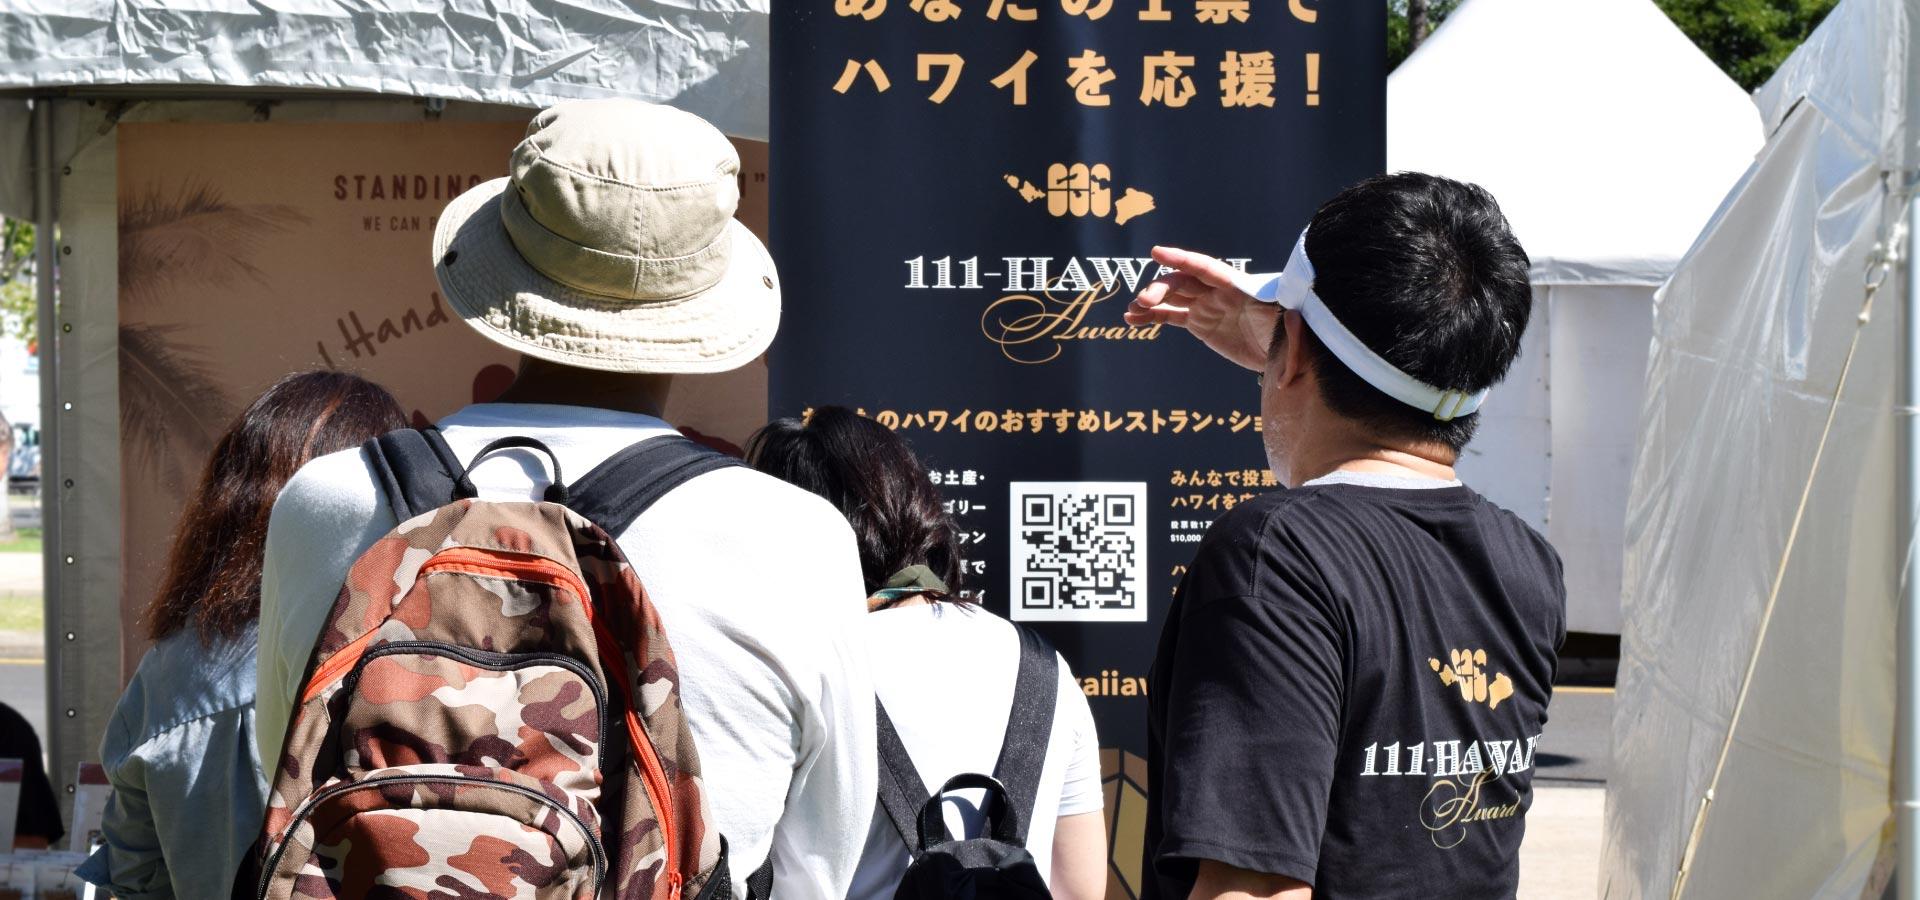 111-Hawaii Award Event Banner